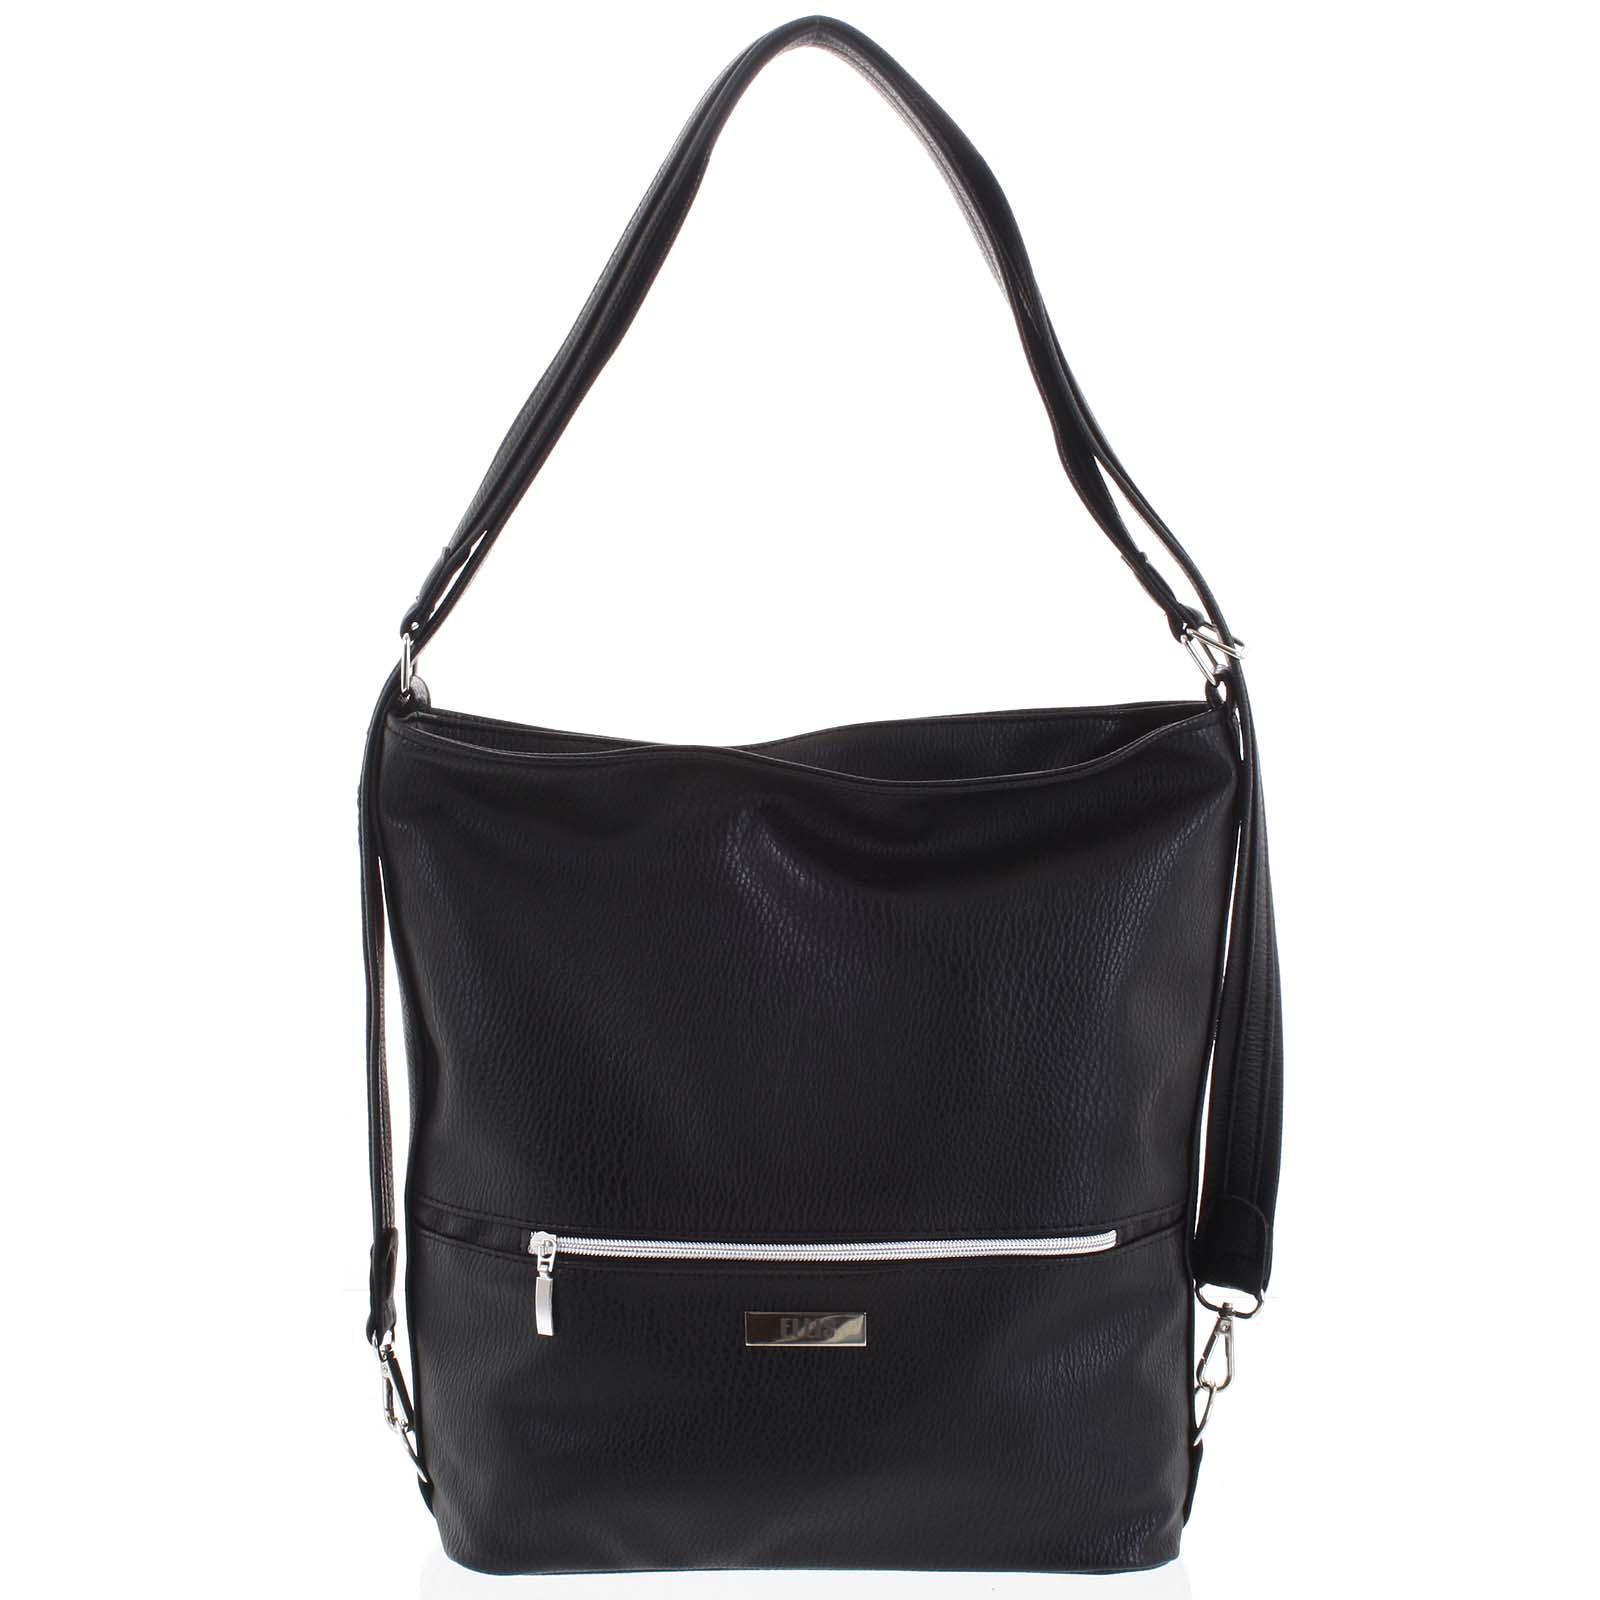 Módní dámská kabelka batoh černá - Ellis Patrik